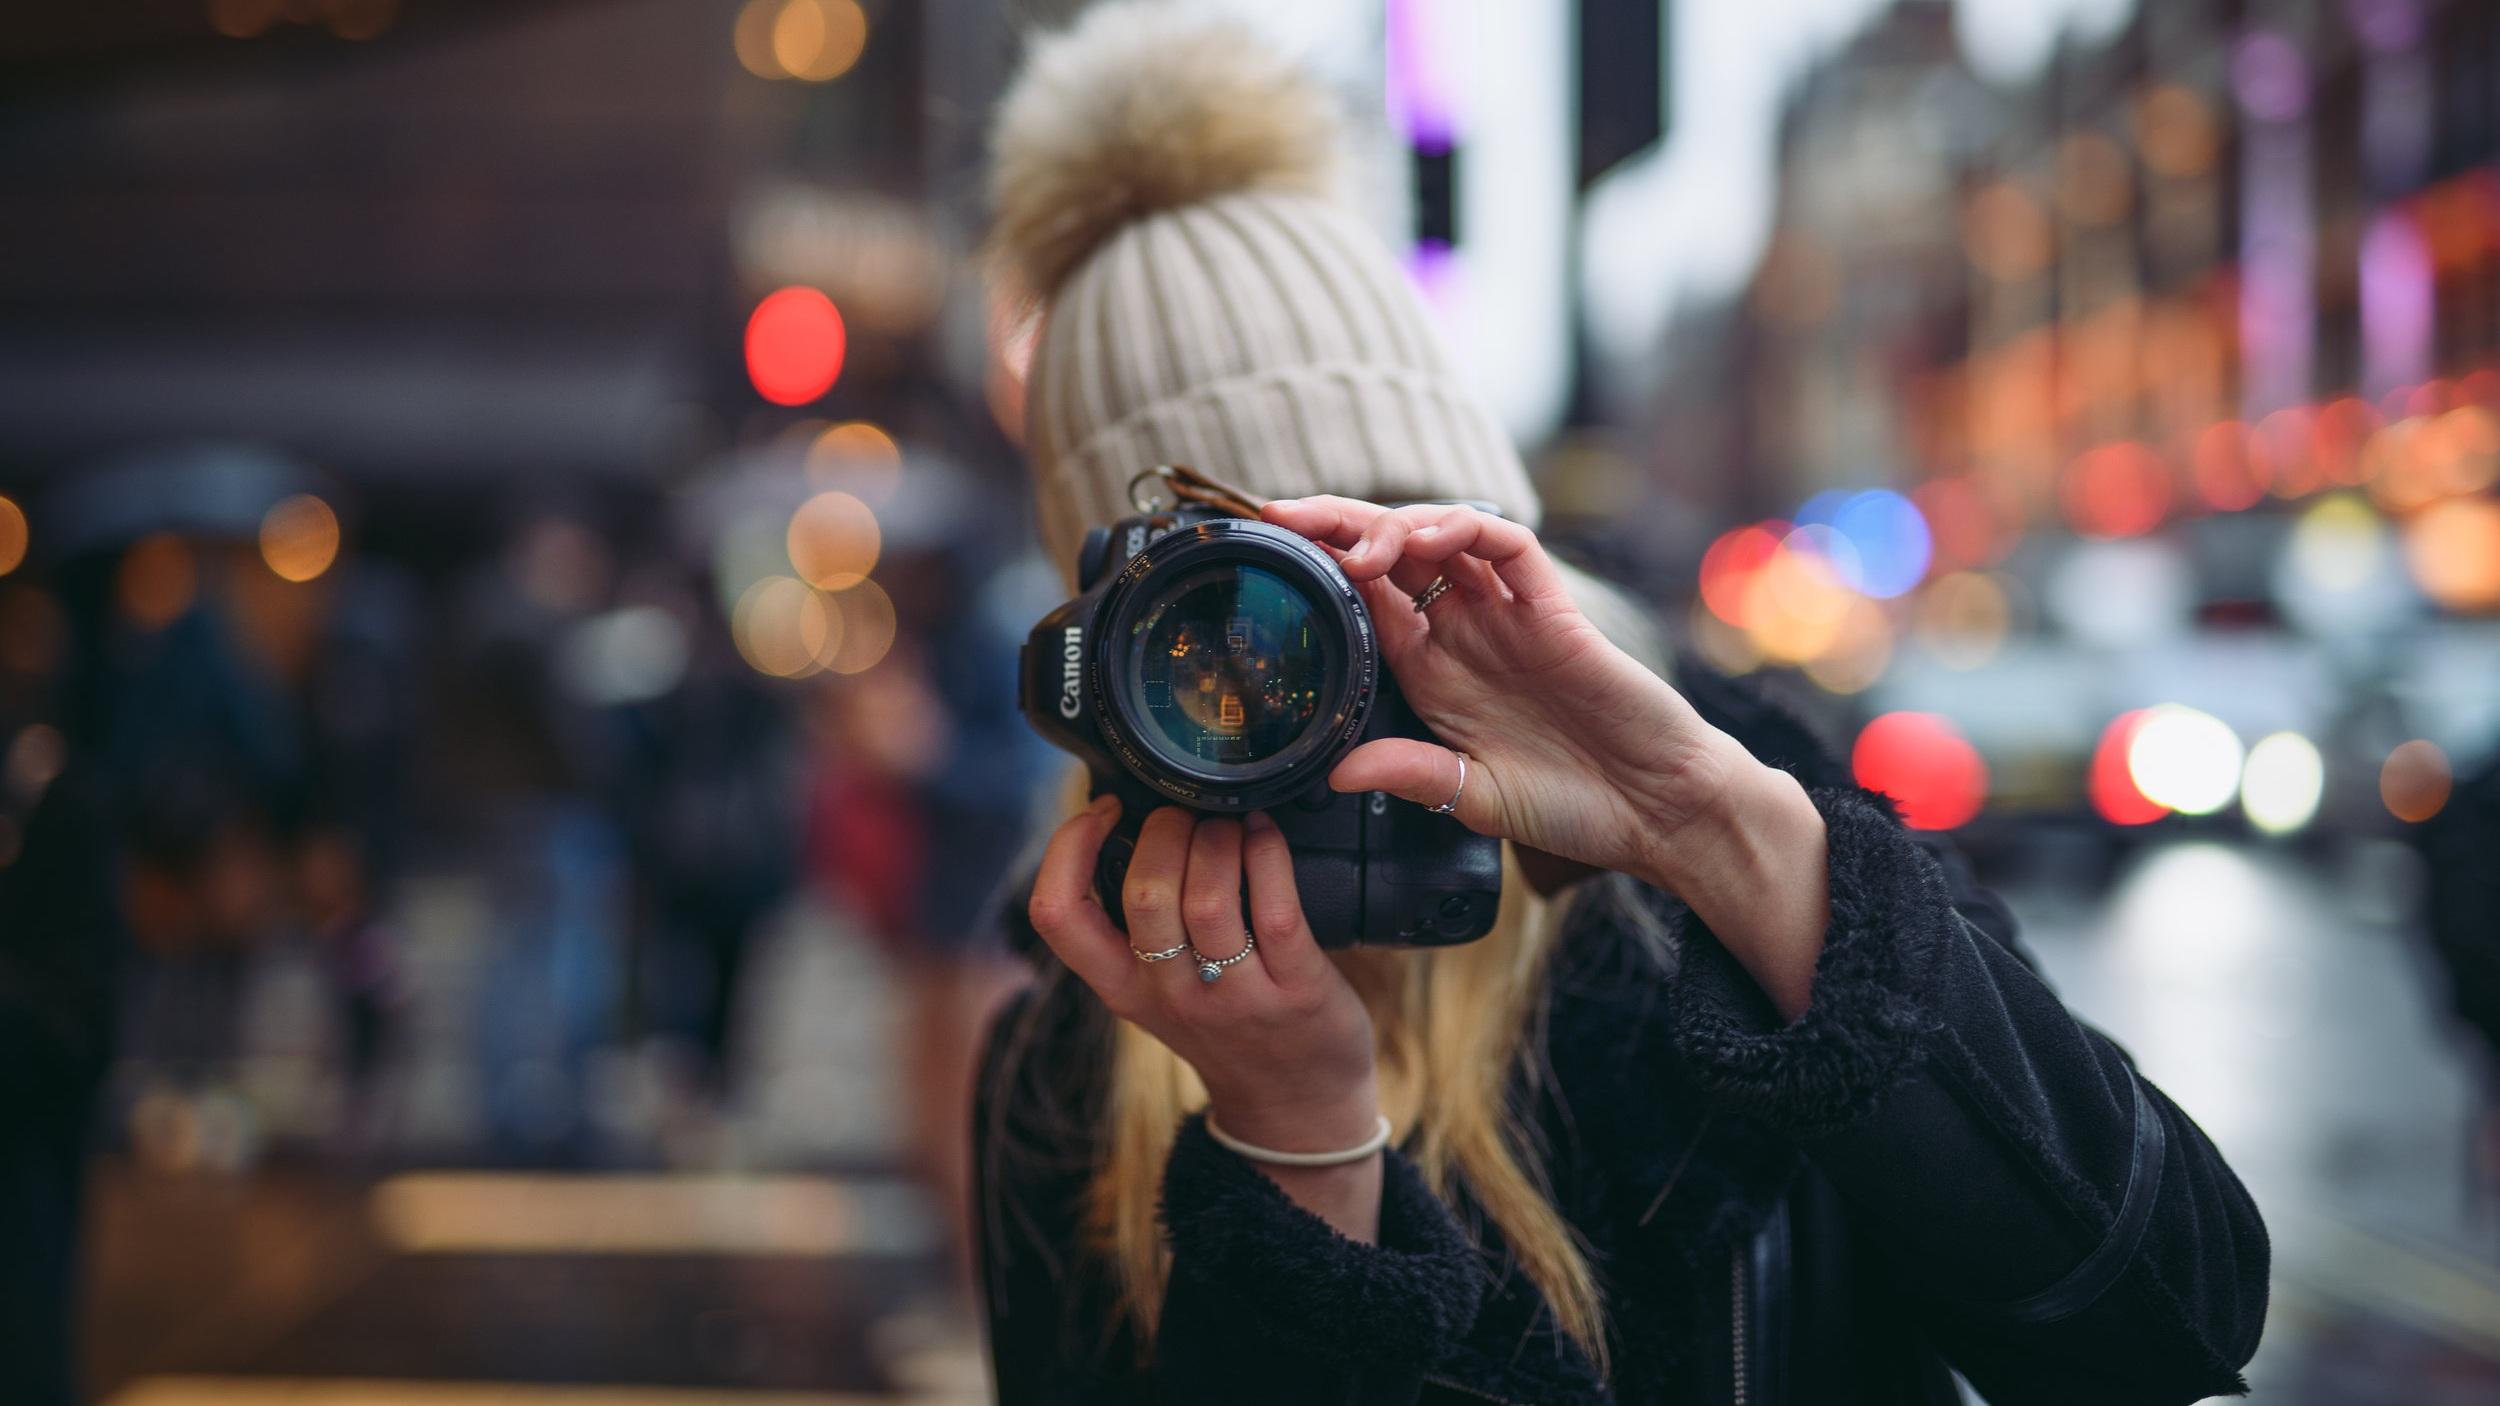 heaven for photographer